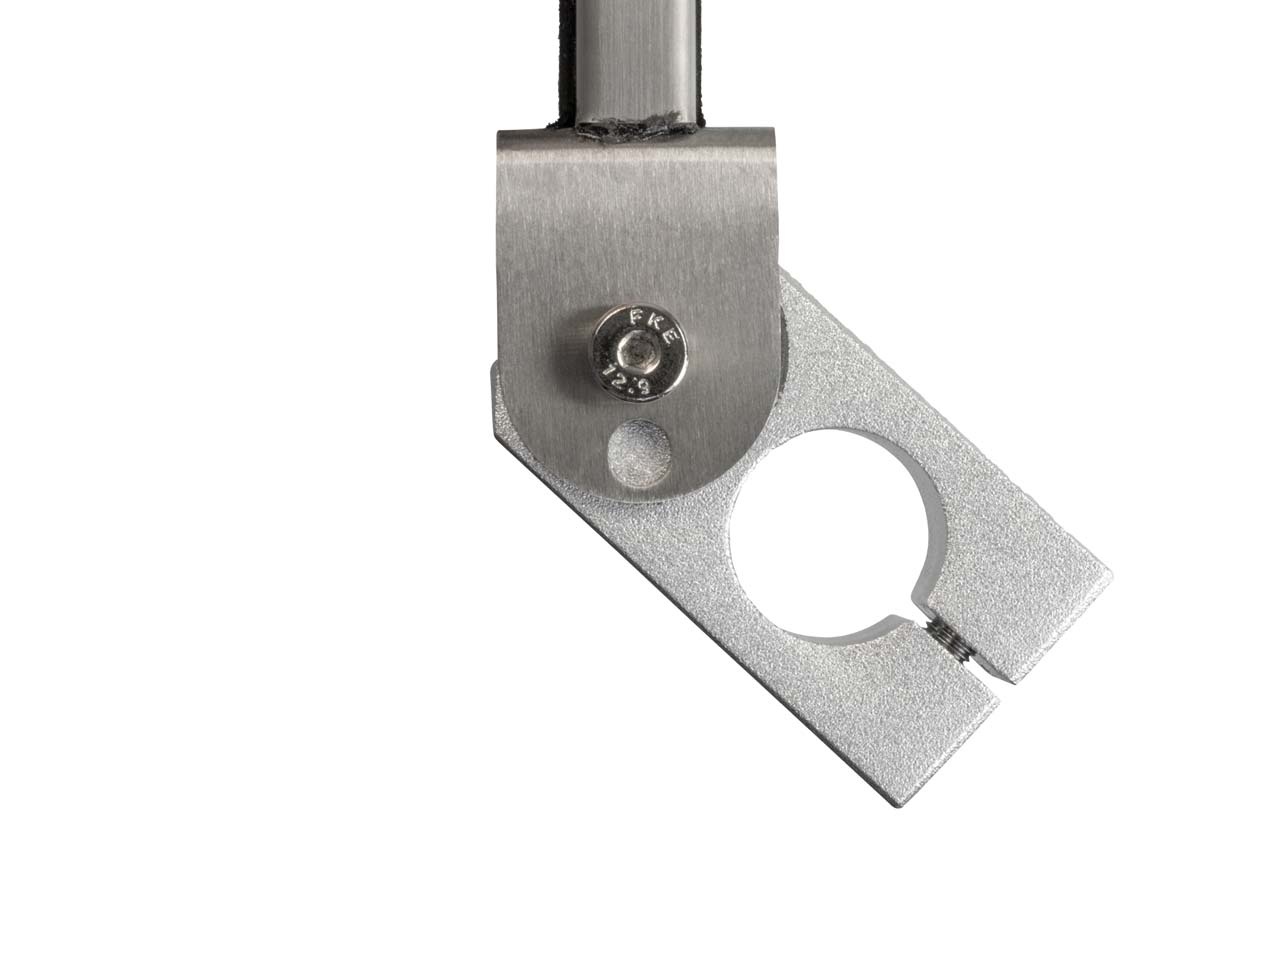 Genuine-US-Foredom-Workbench-Accessories-System miniatura 35